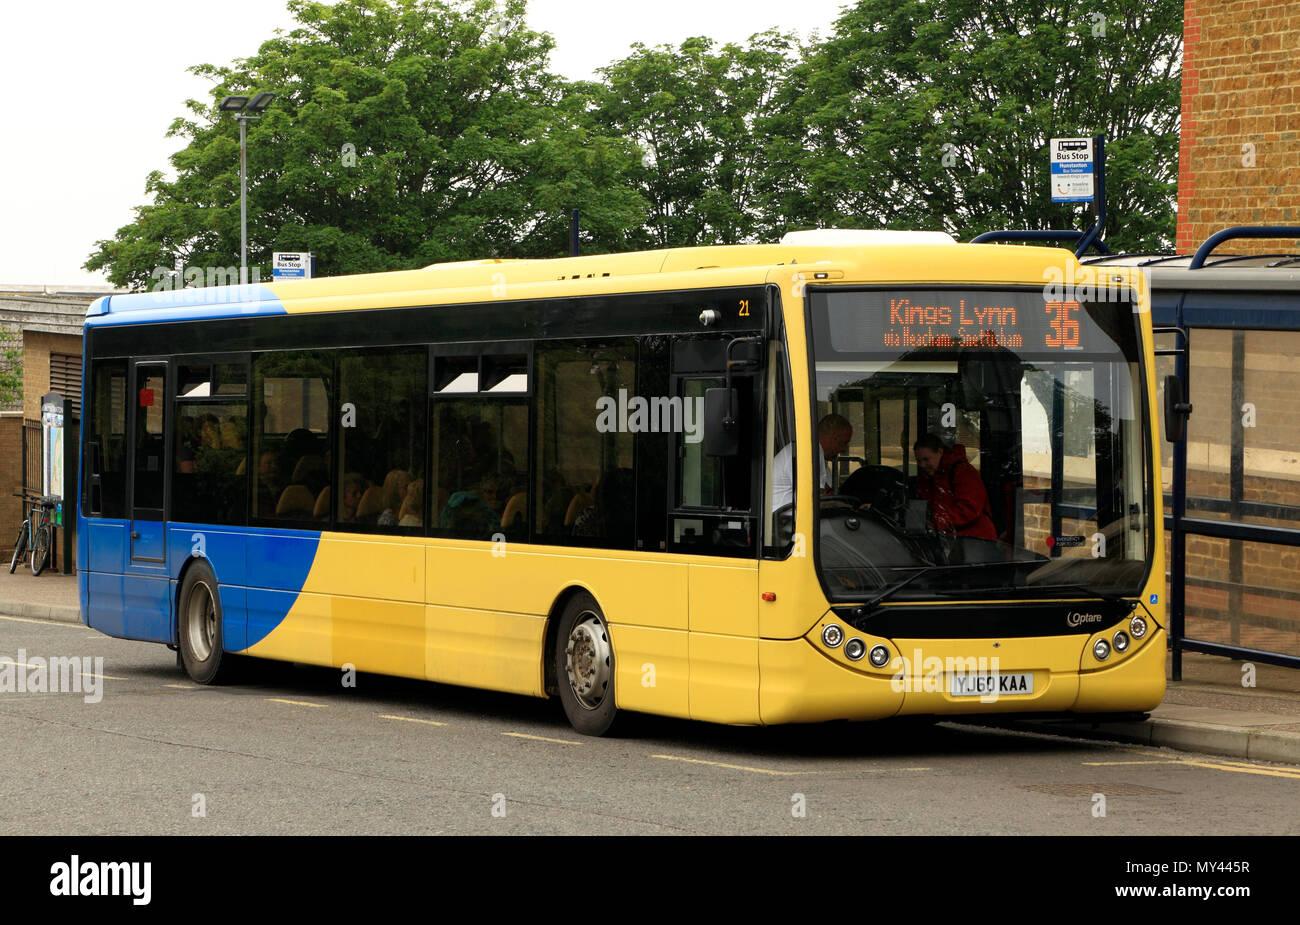 Hunstanton to Kings Lynn, bus, public transport, Norfolk, England, UK - Stock Image